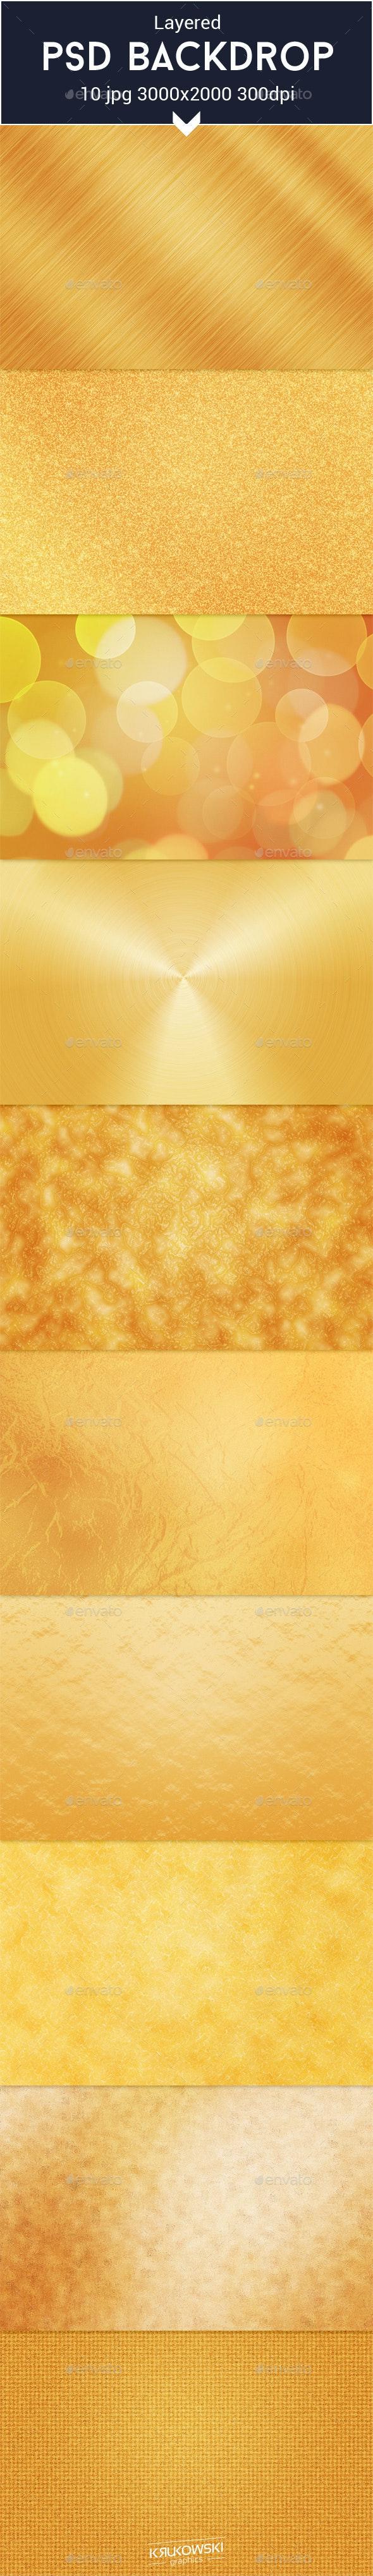 Gold Texture PSD - Patterns Backgrounds